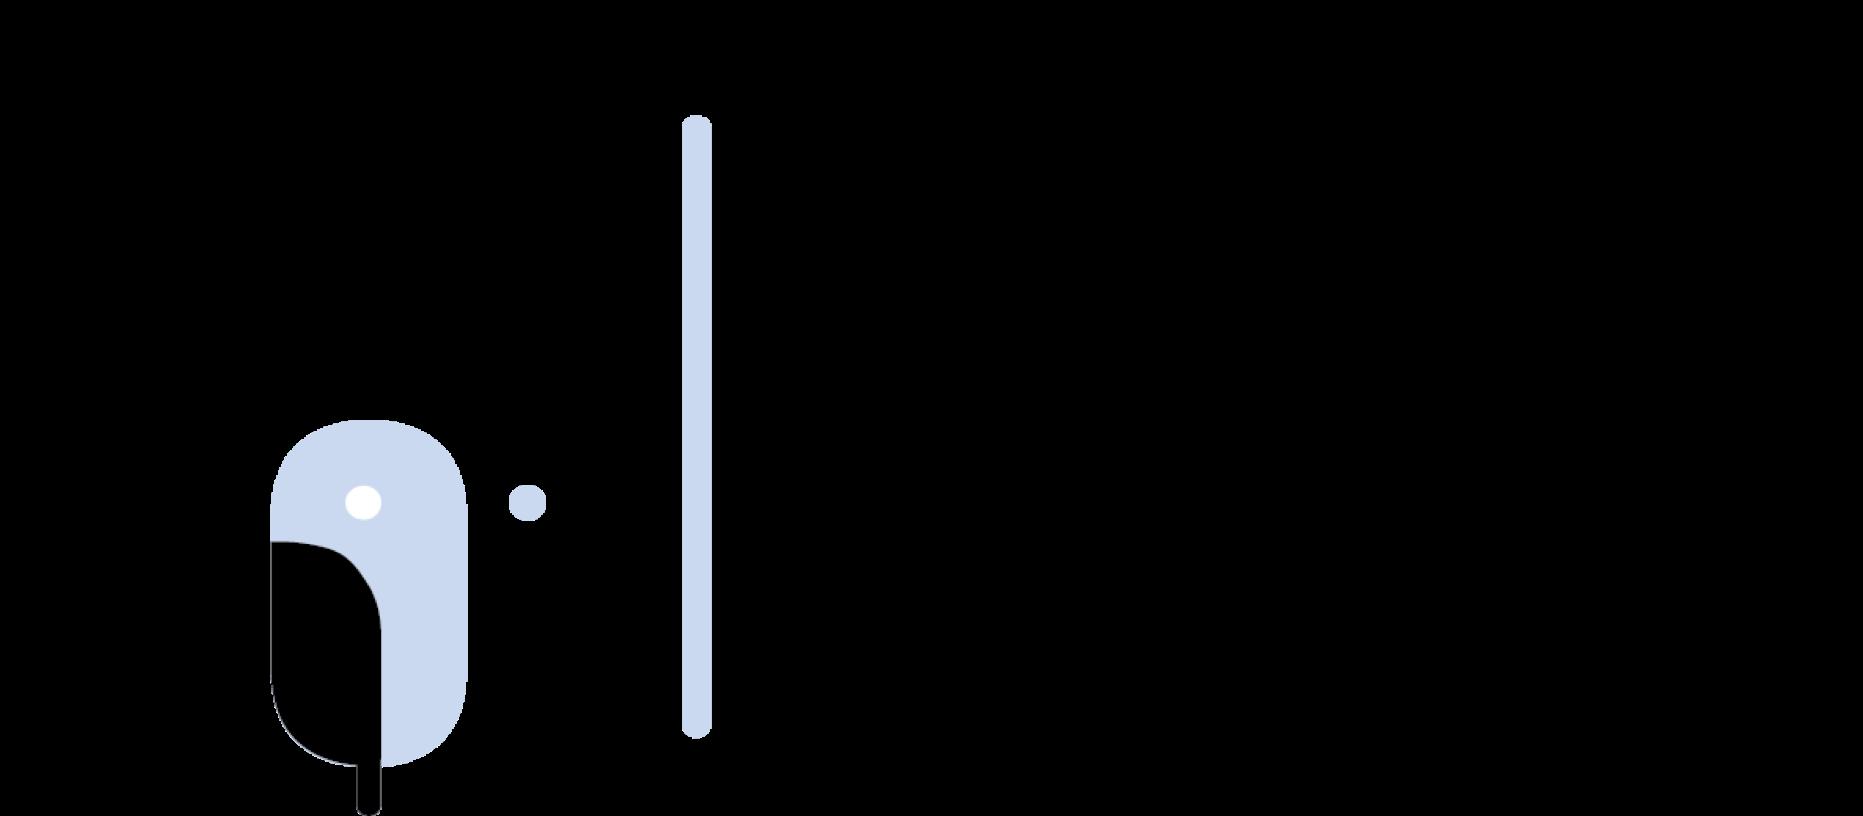 ShuQi logo